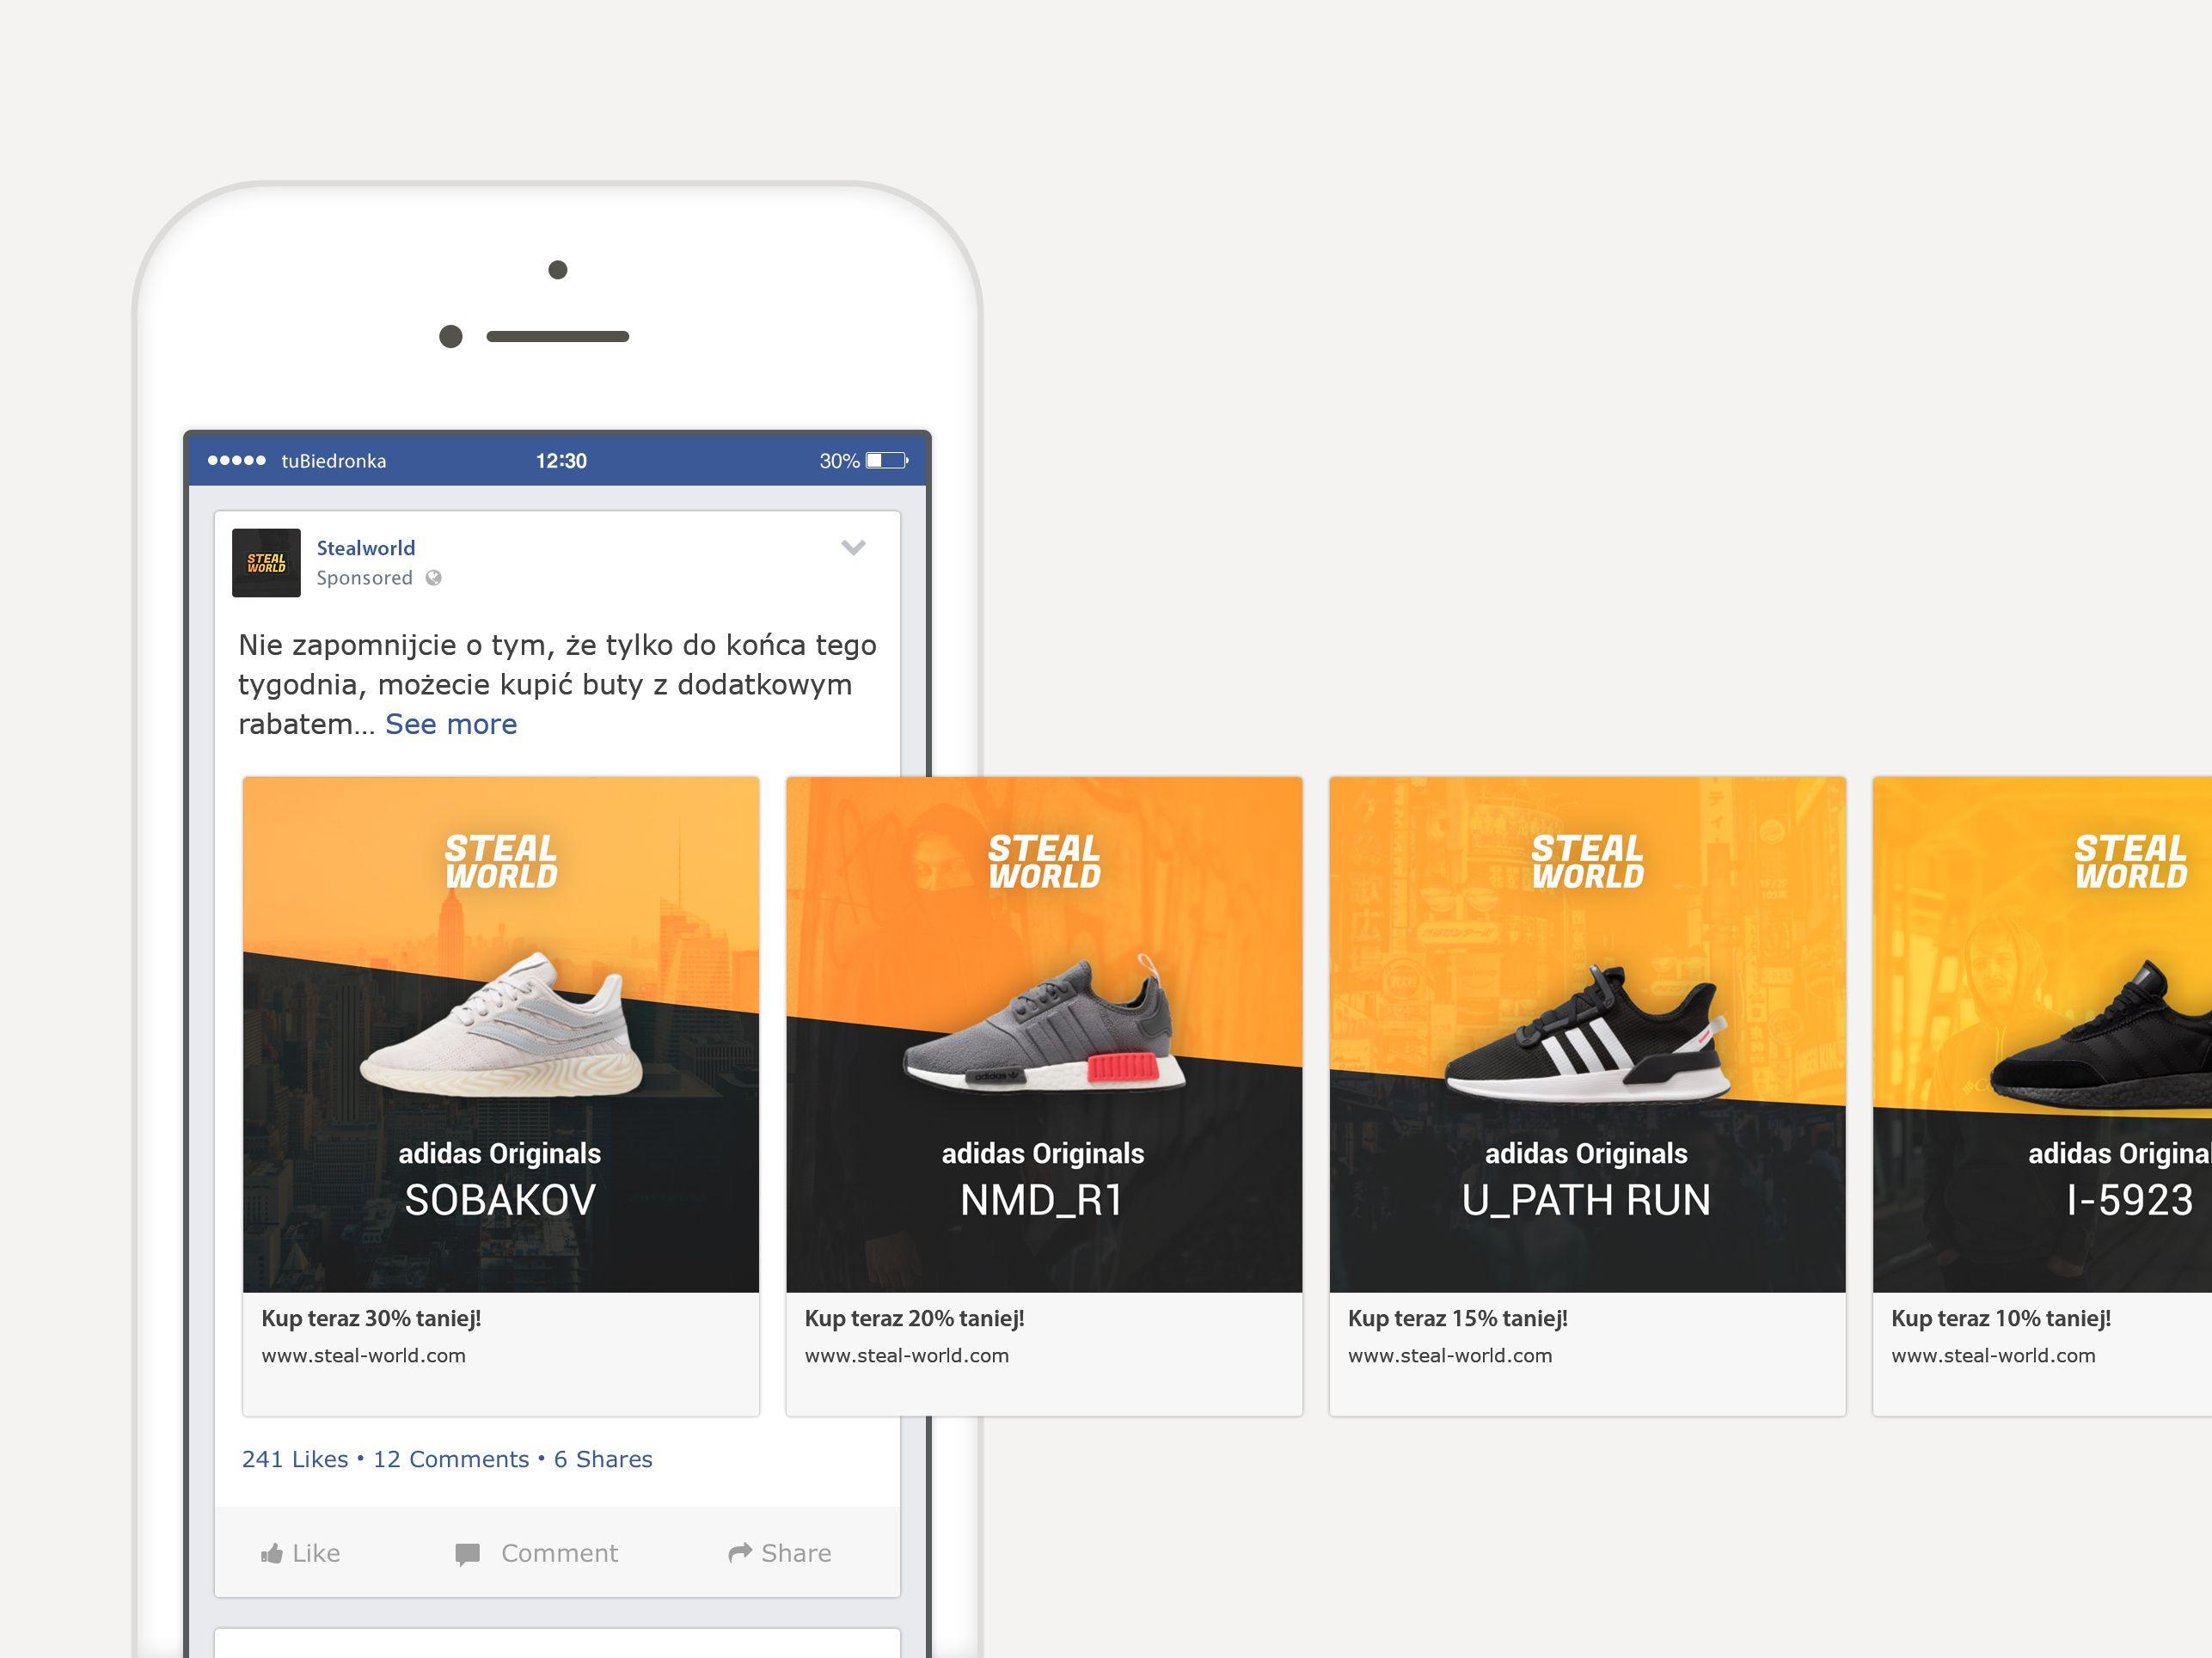 Carousel Advertisement On Facebook In 2020 Facebook Design Social Media Design Inspiration Advertising